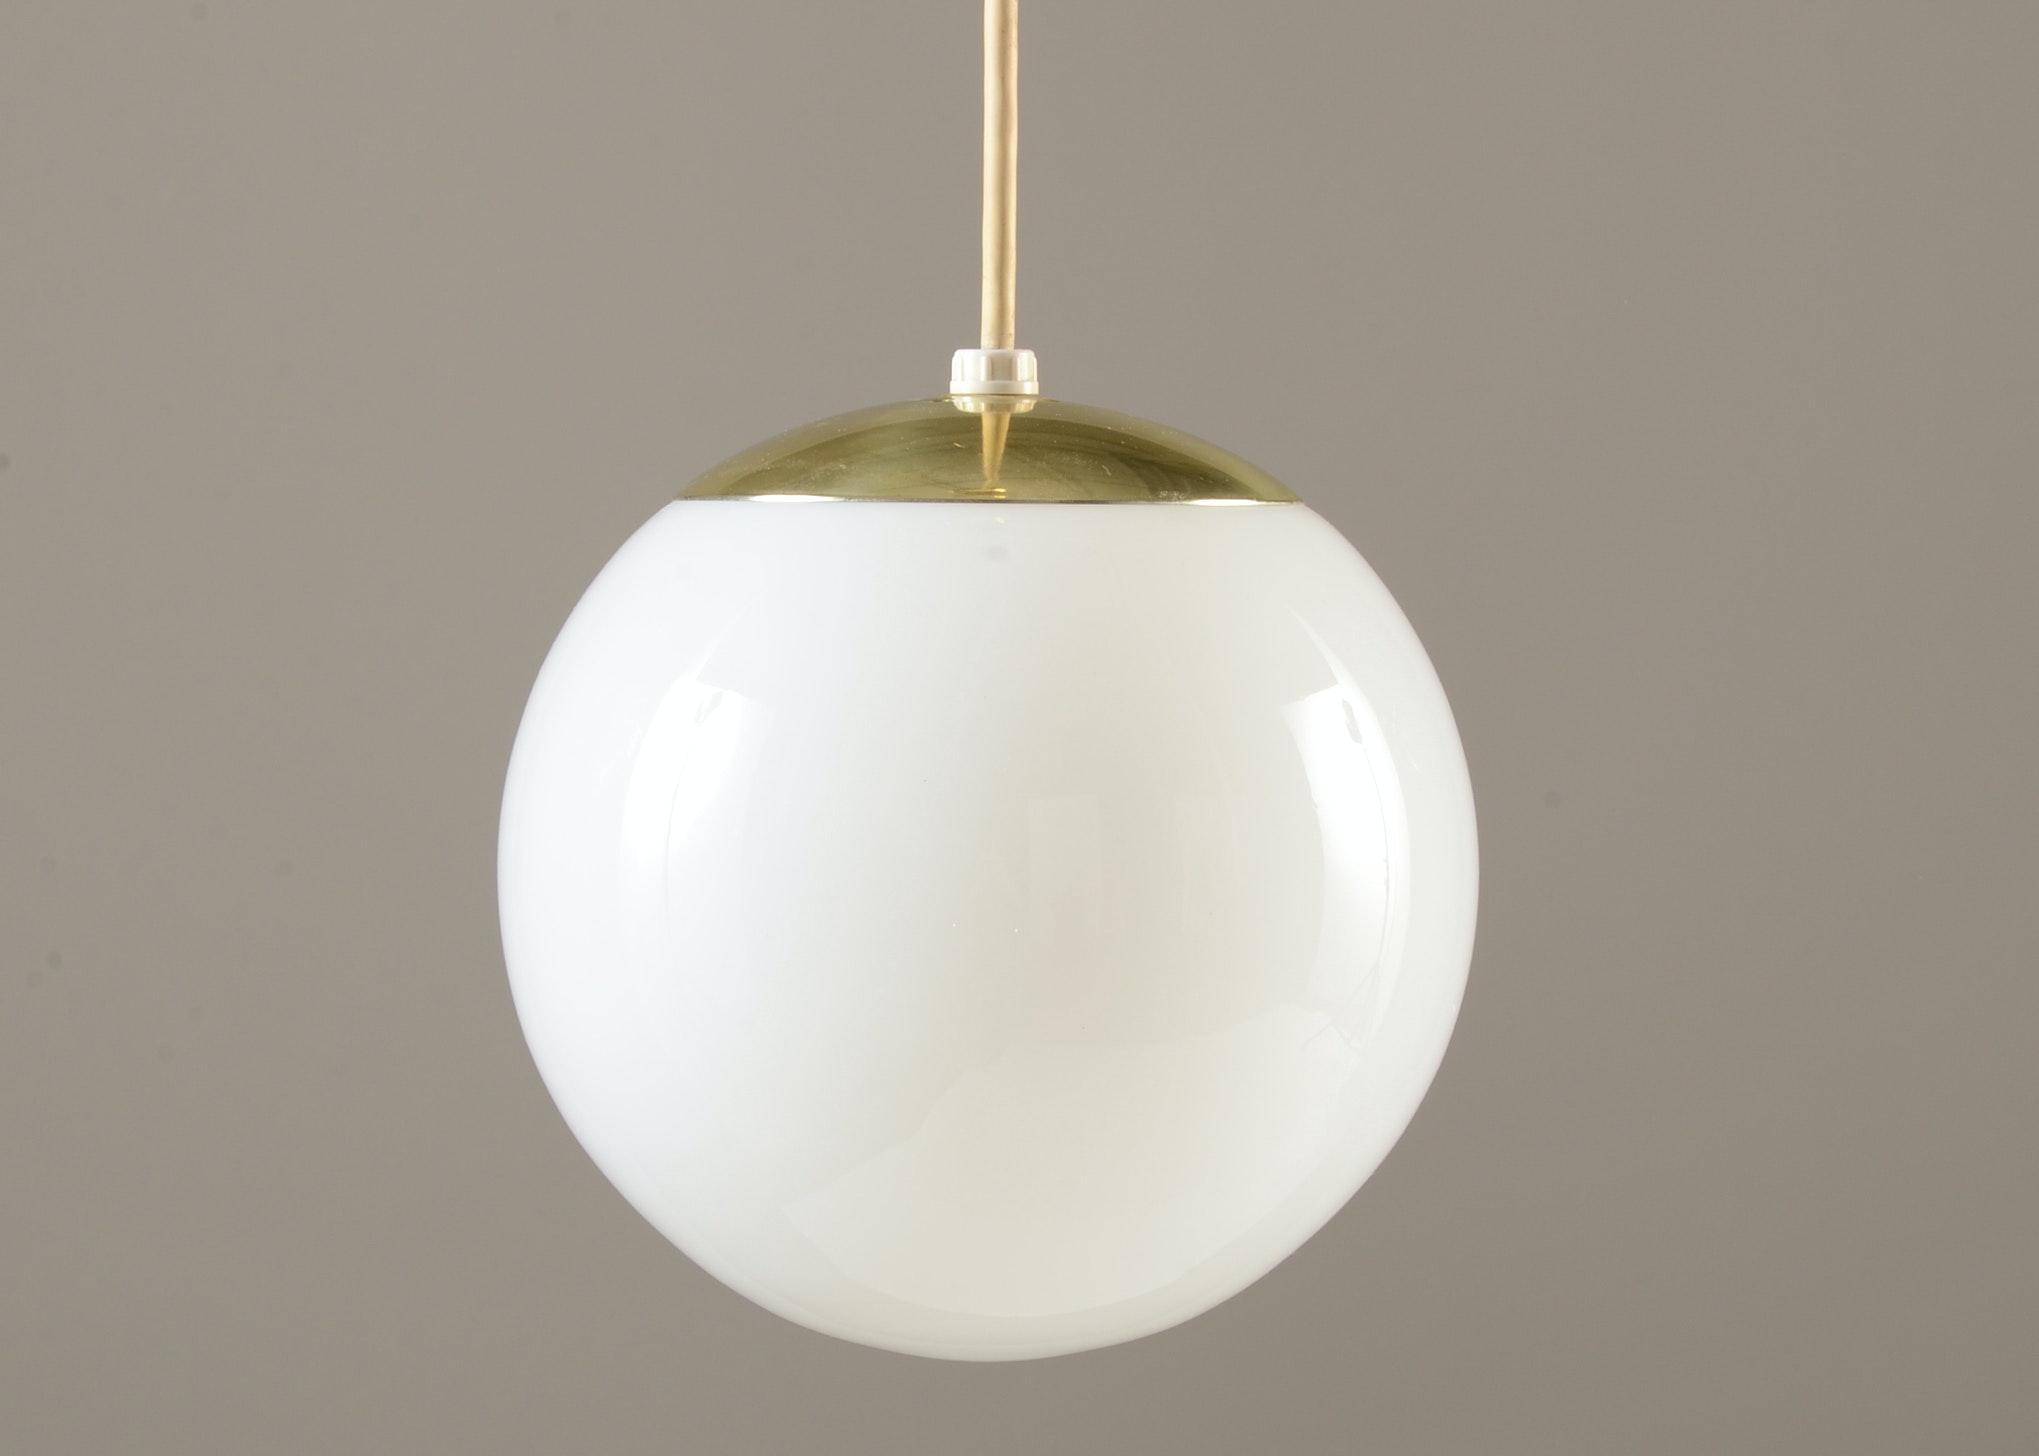 midcentury globe pendant light - Globe Pendant Light